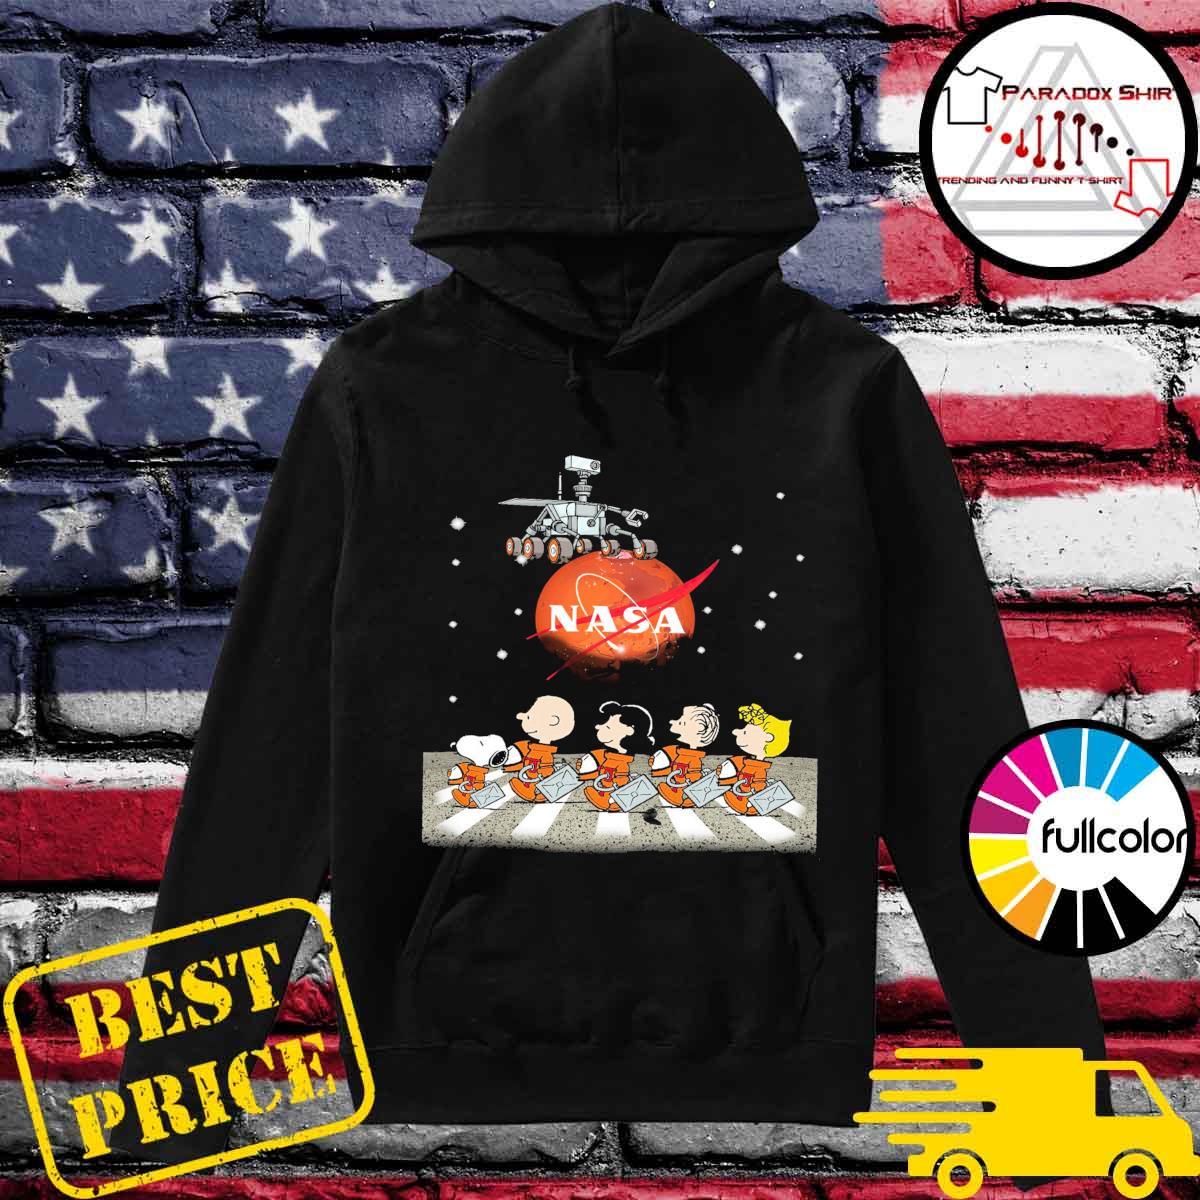 The Peanuts Walking on the Moon Nasa s Hoodie